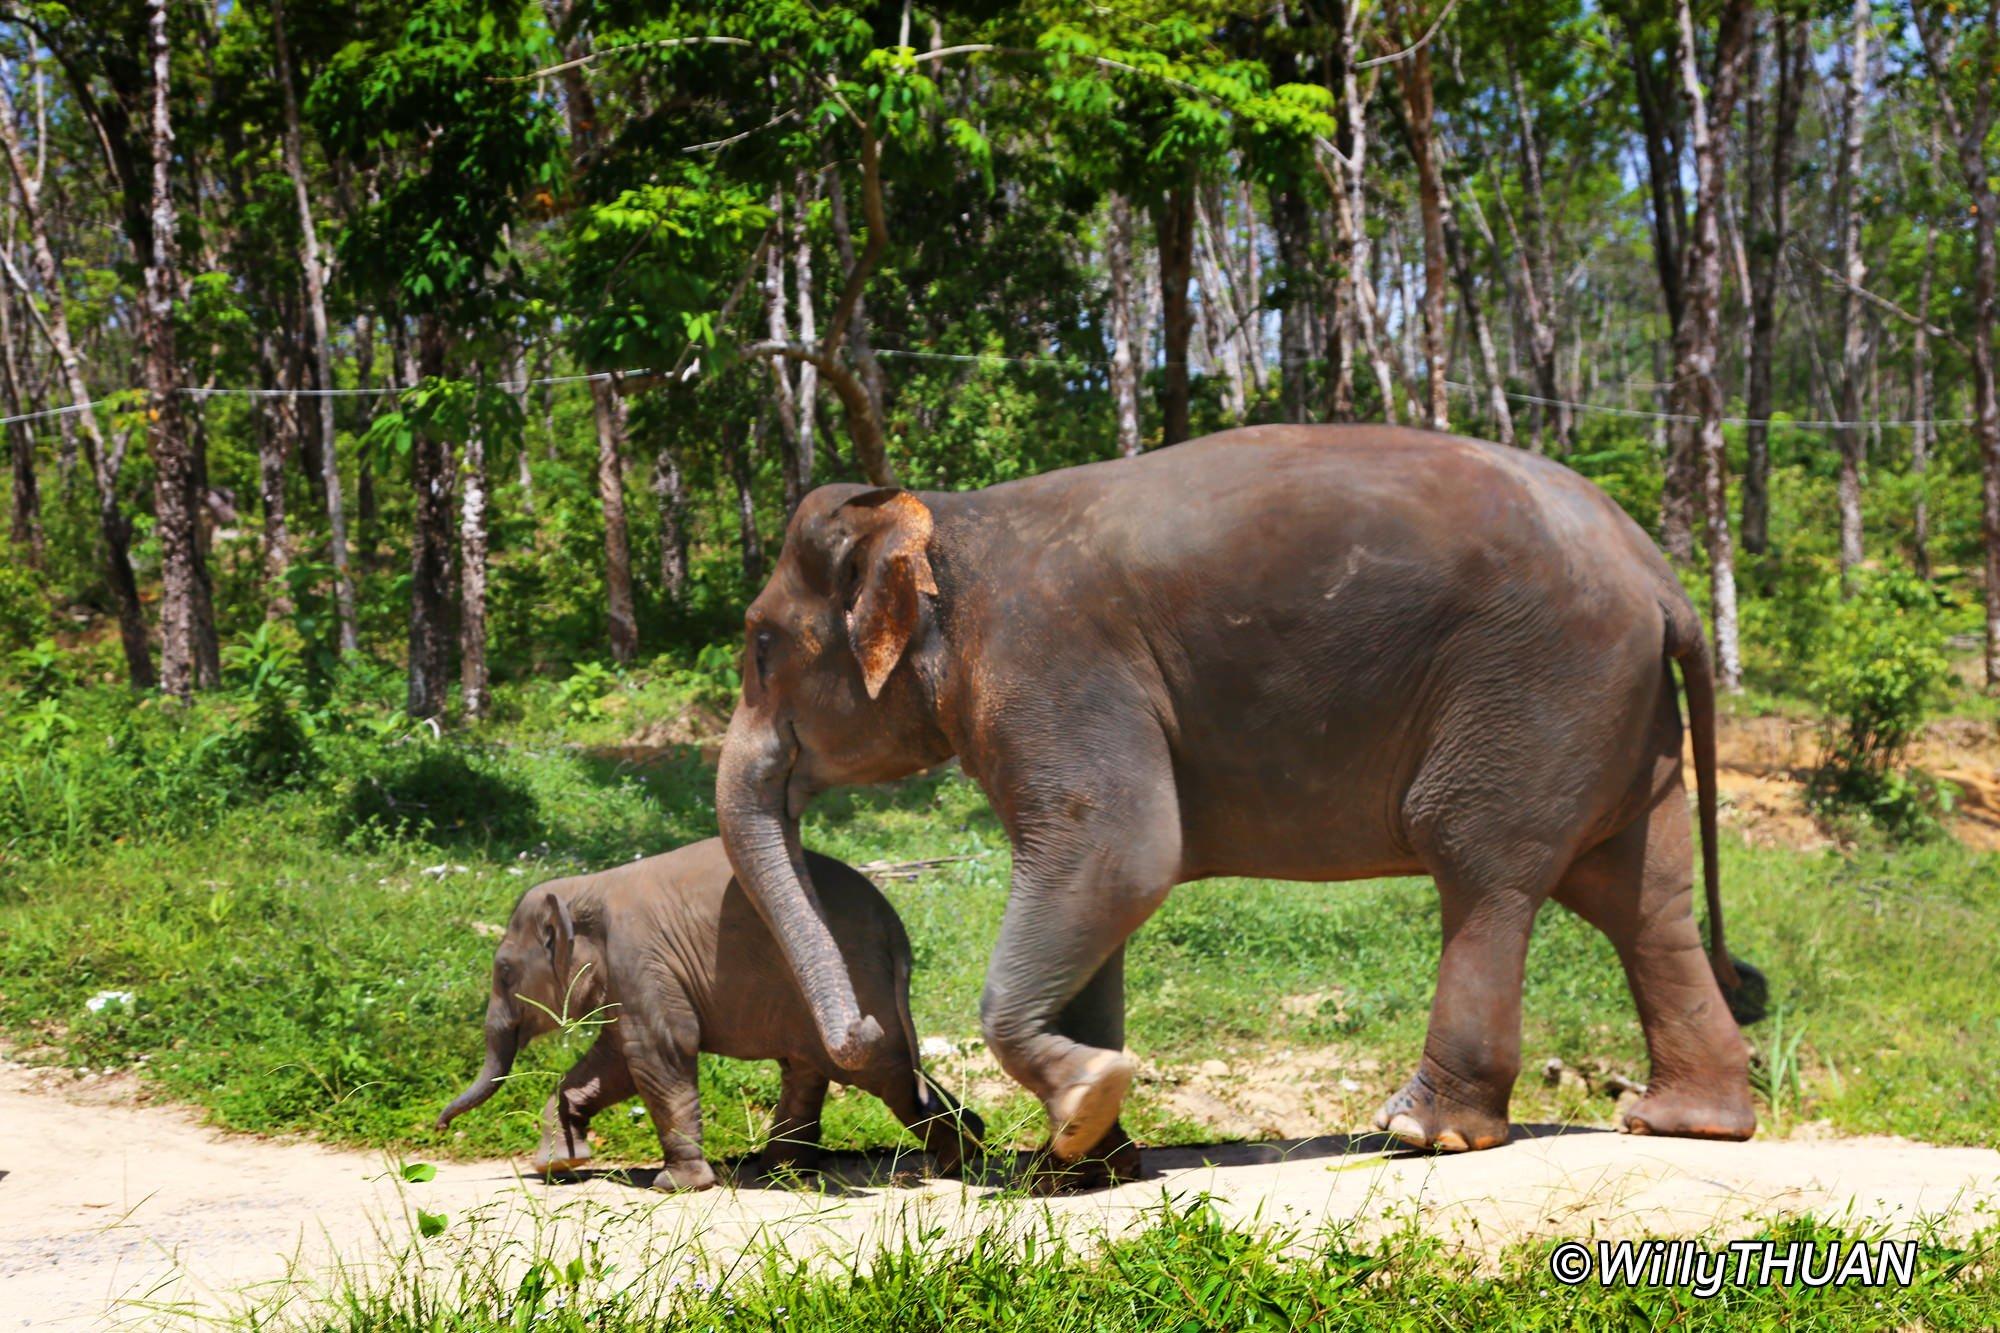 Elephant Trekking and Elephant Sanctuaries in Phuket